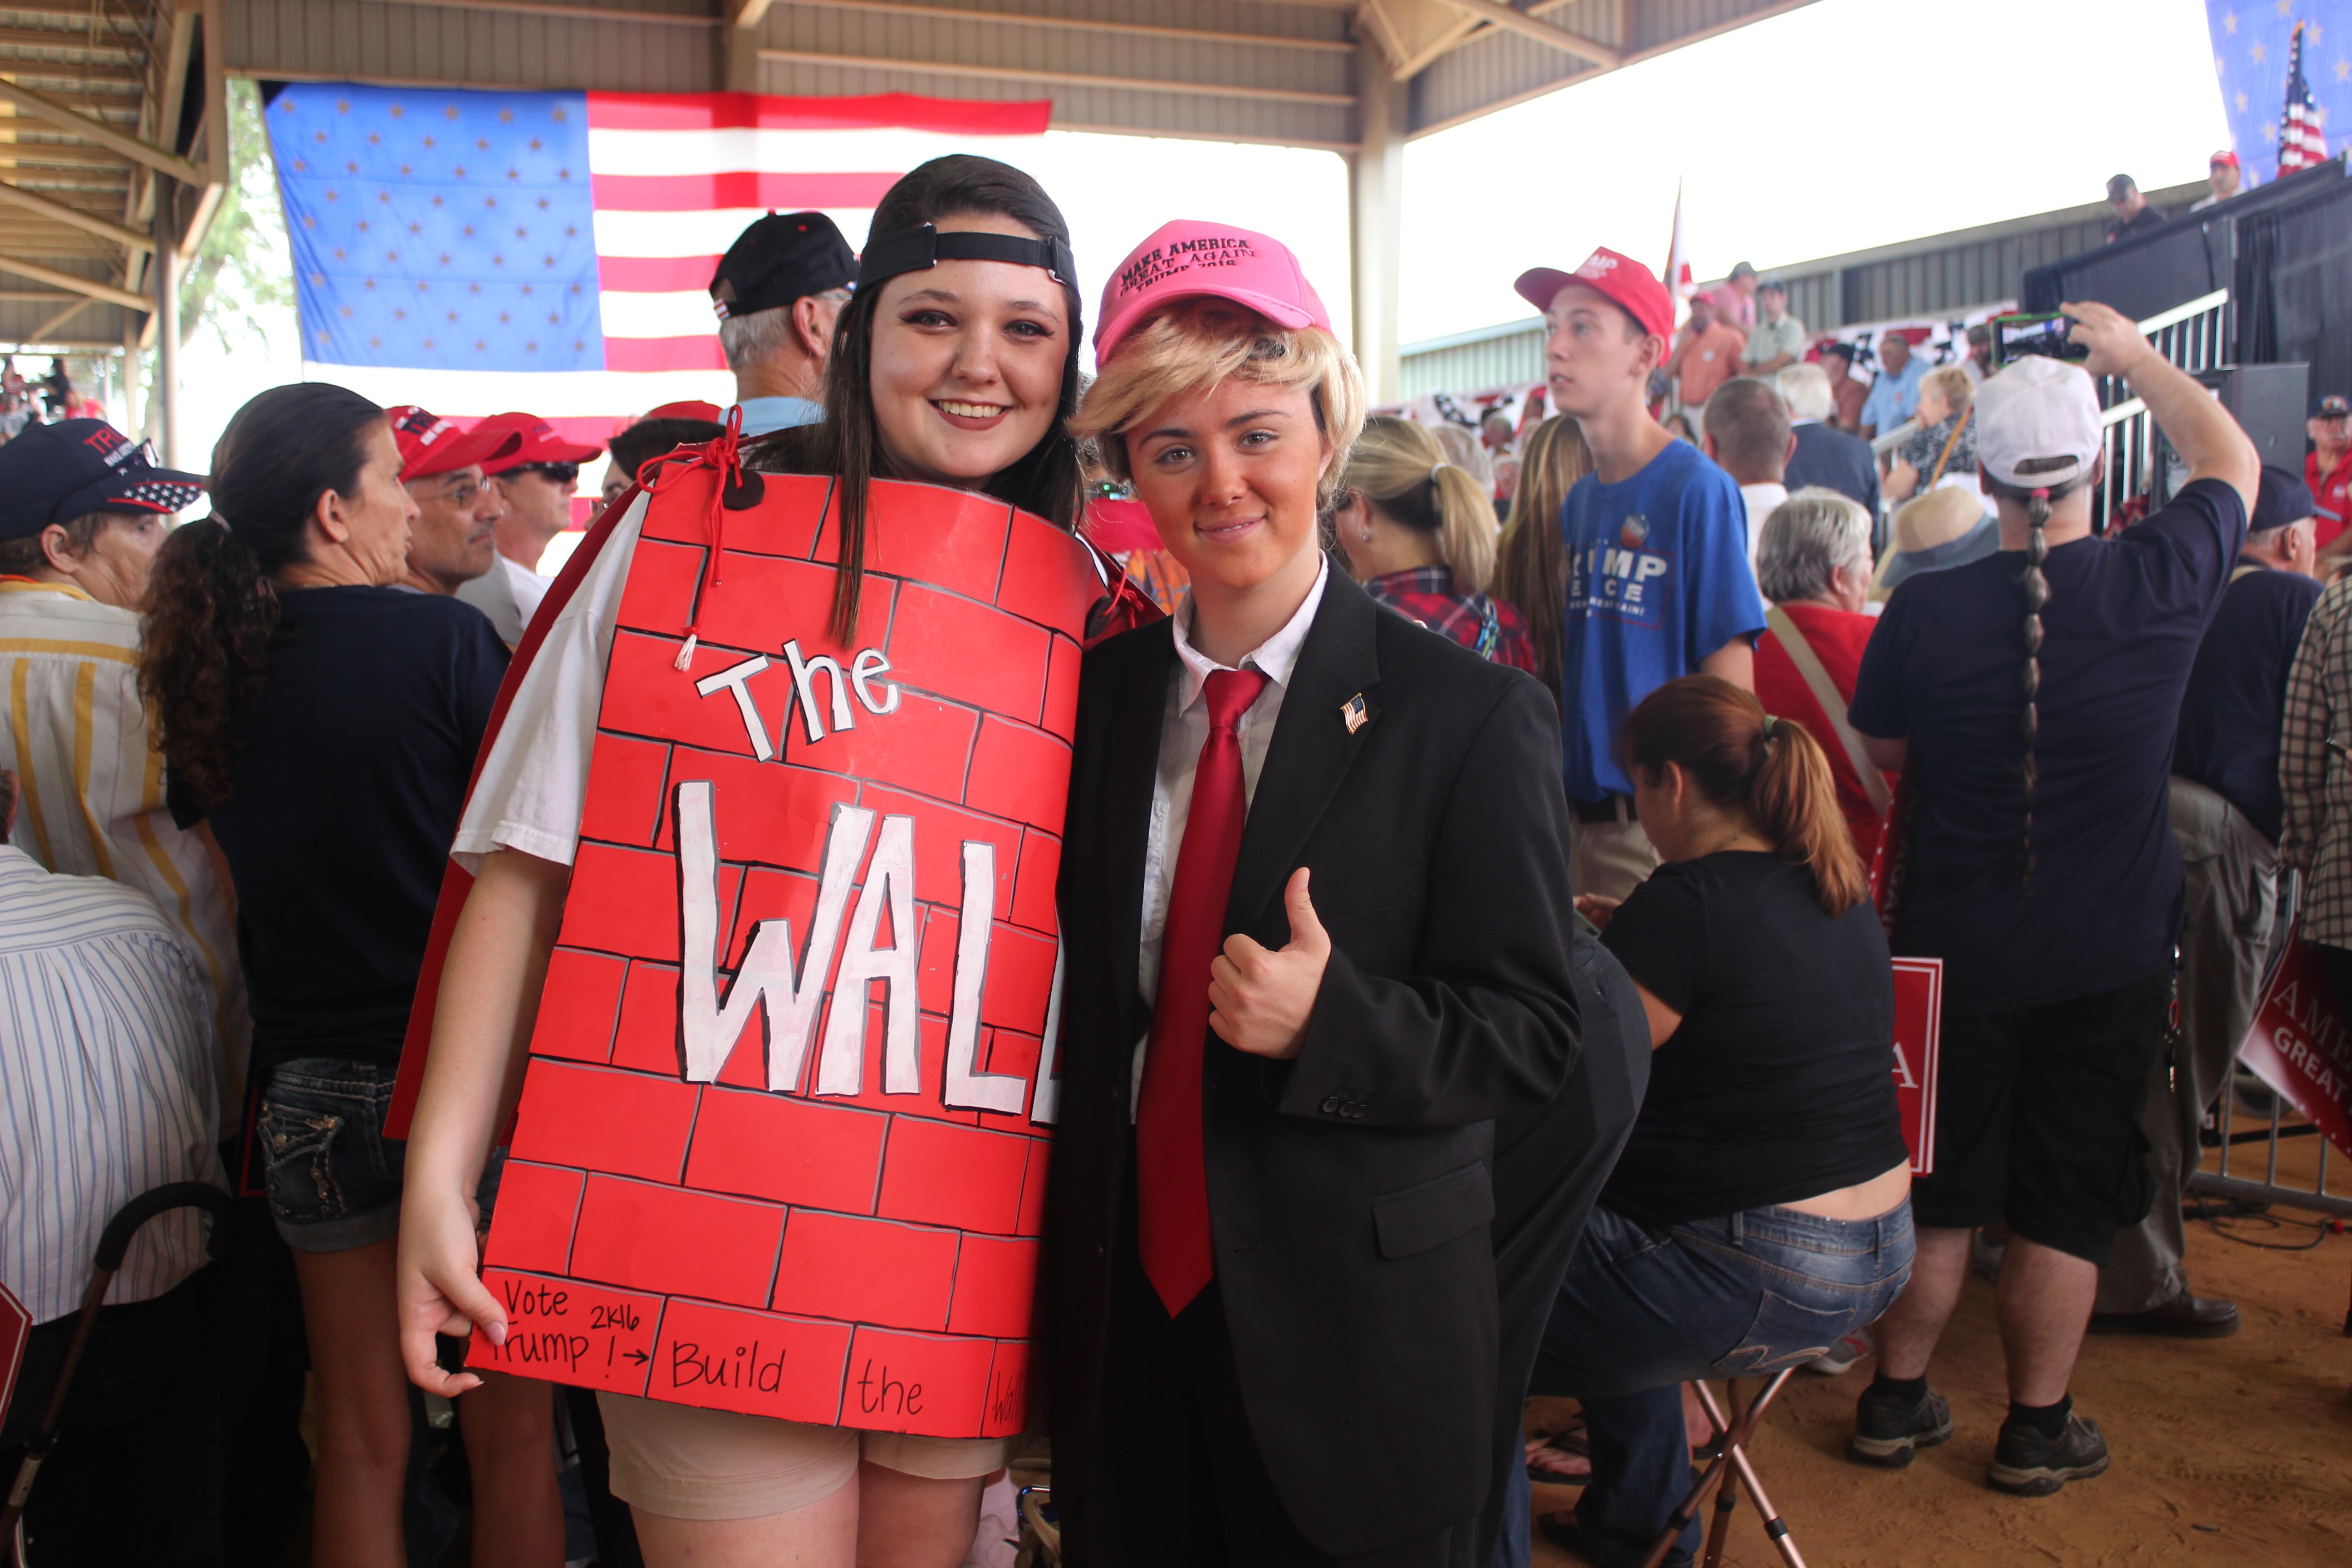 donald trump, build that wall